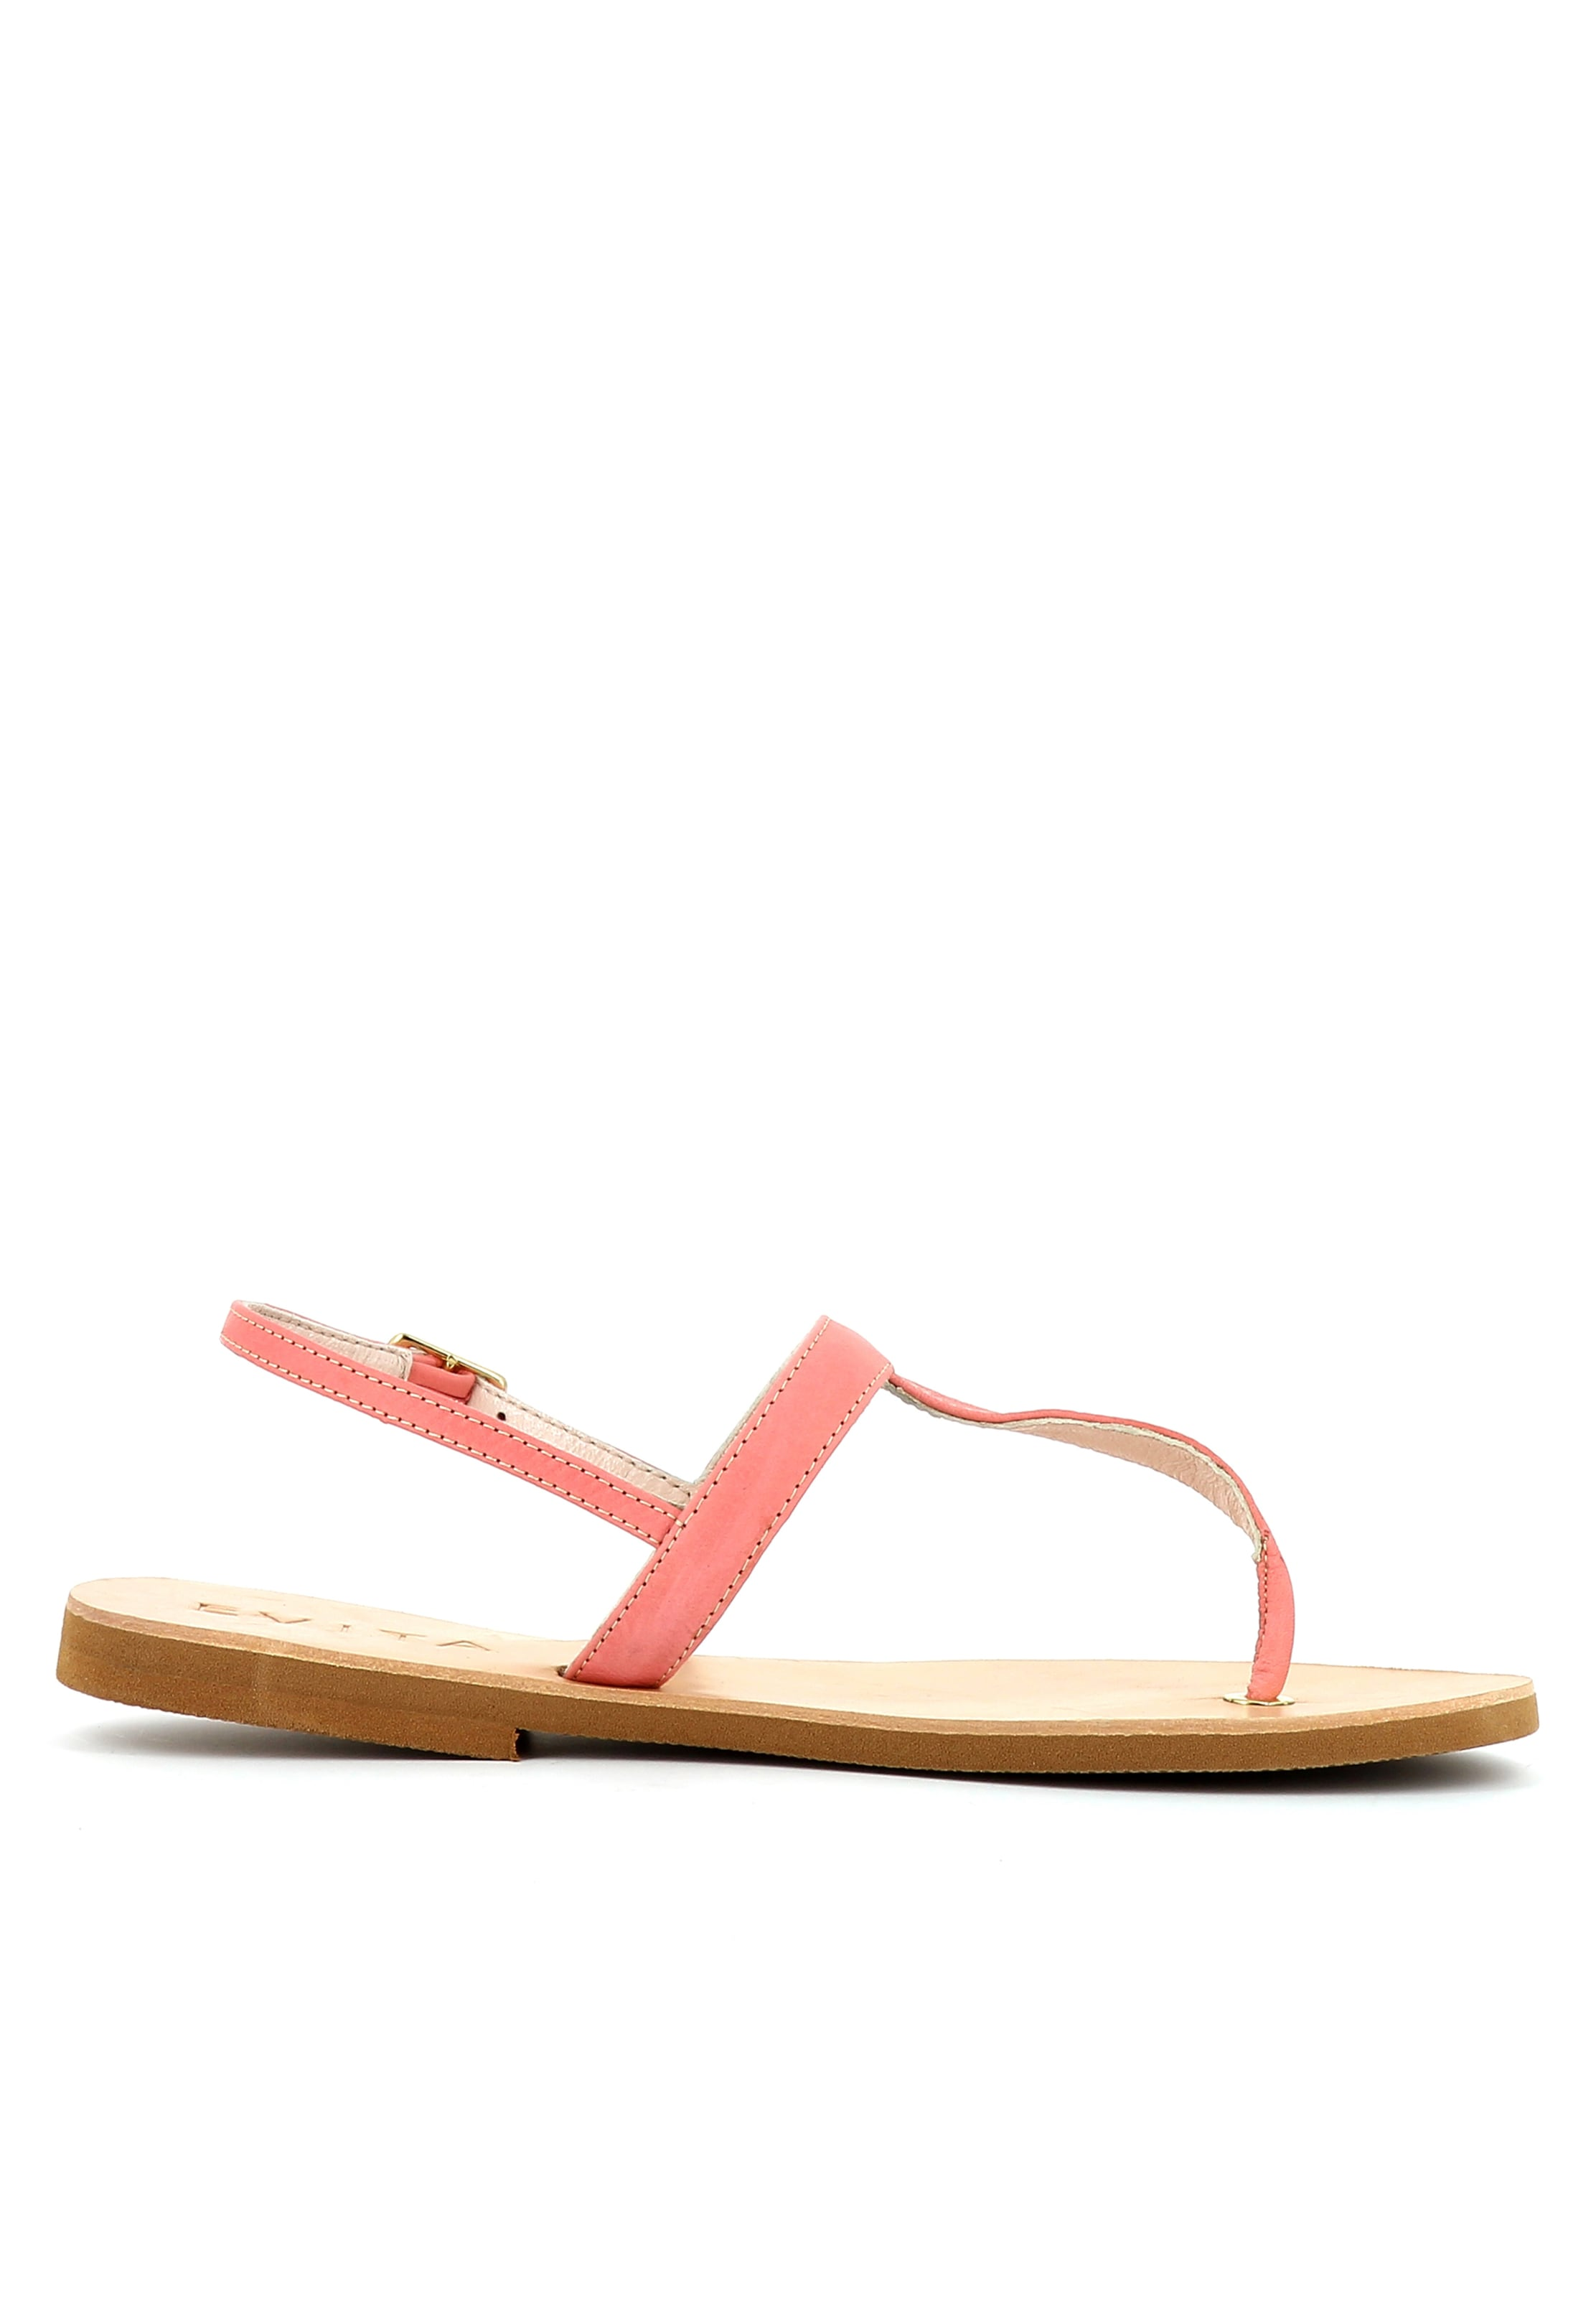 EVITA Damen Sandale Rabatt Offiziell WGJBqy1P